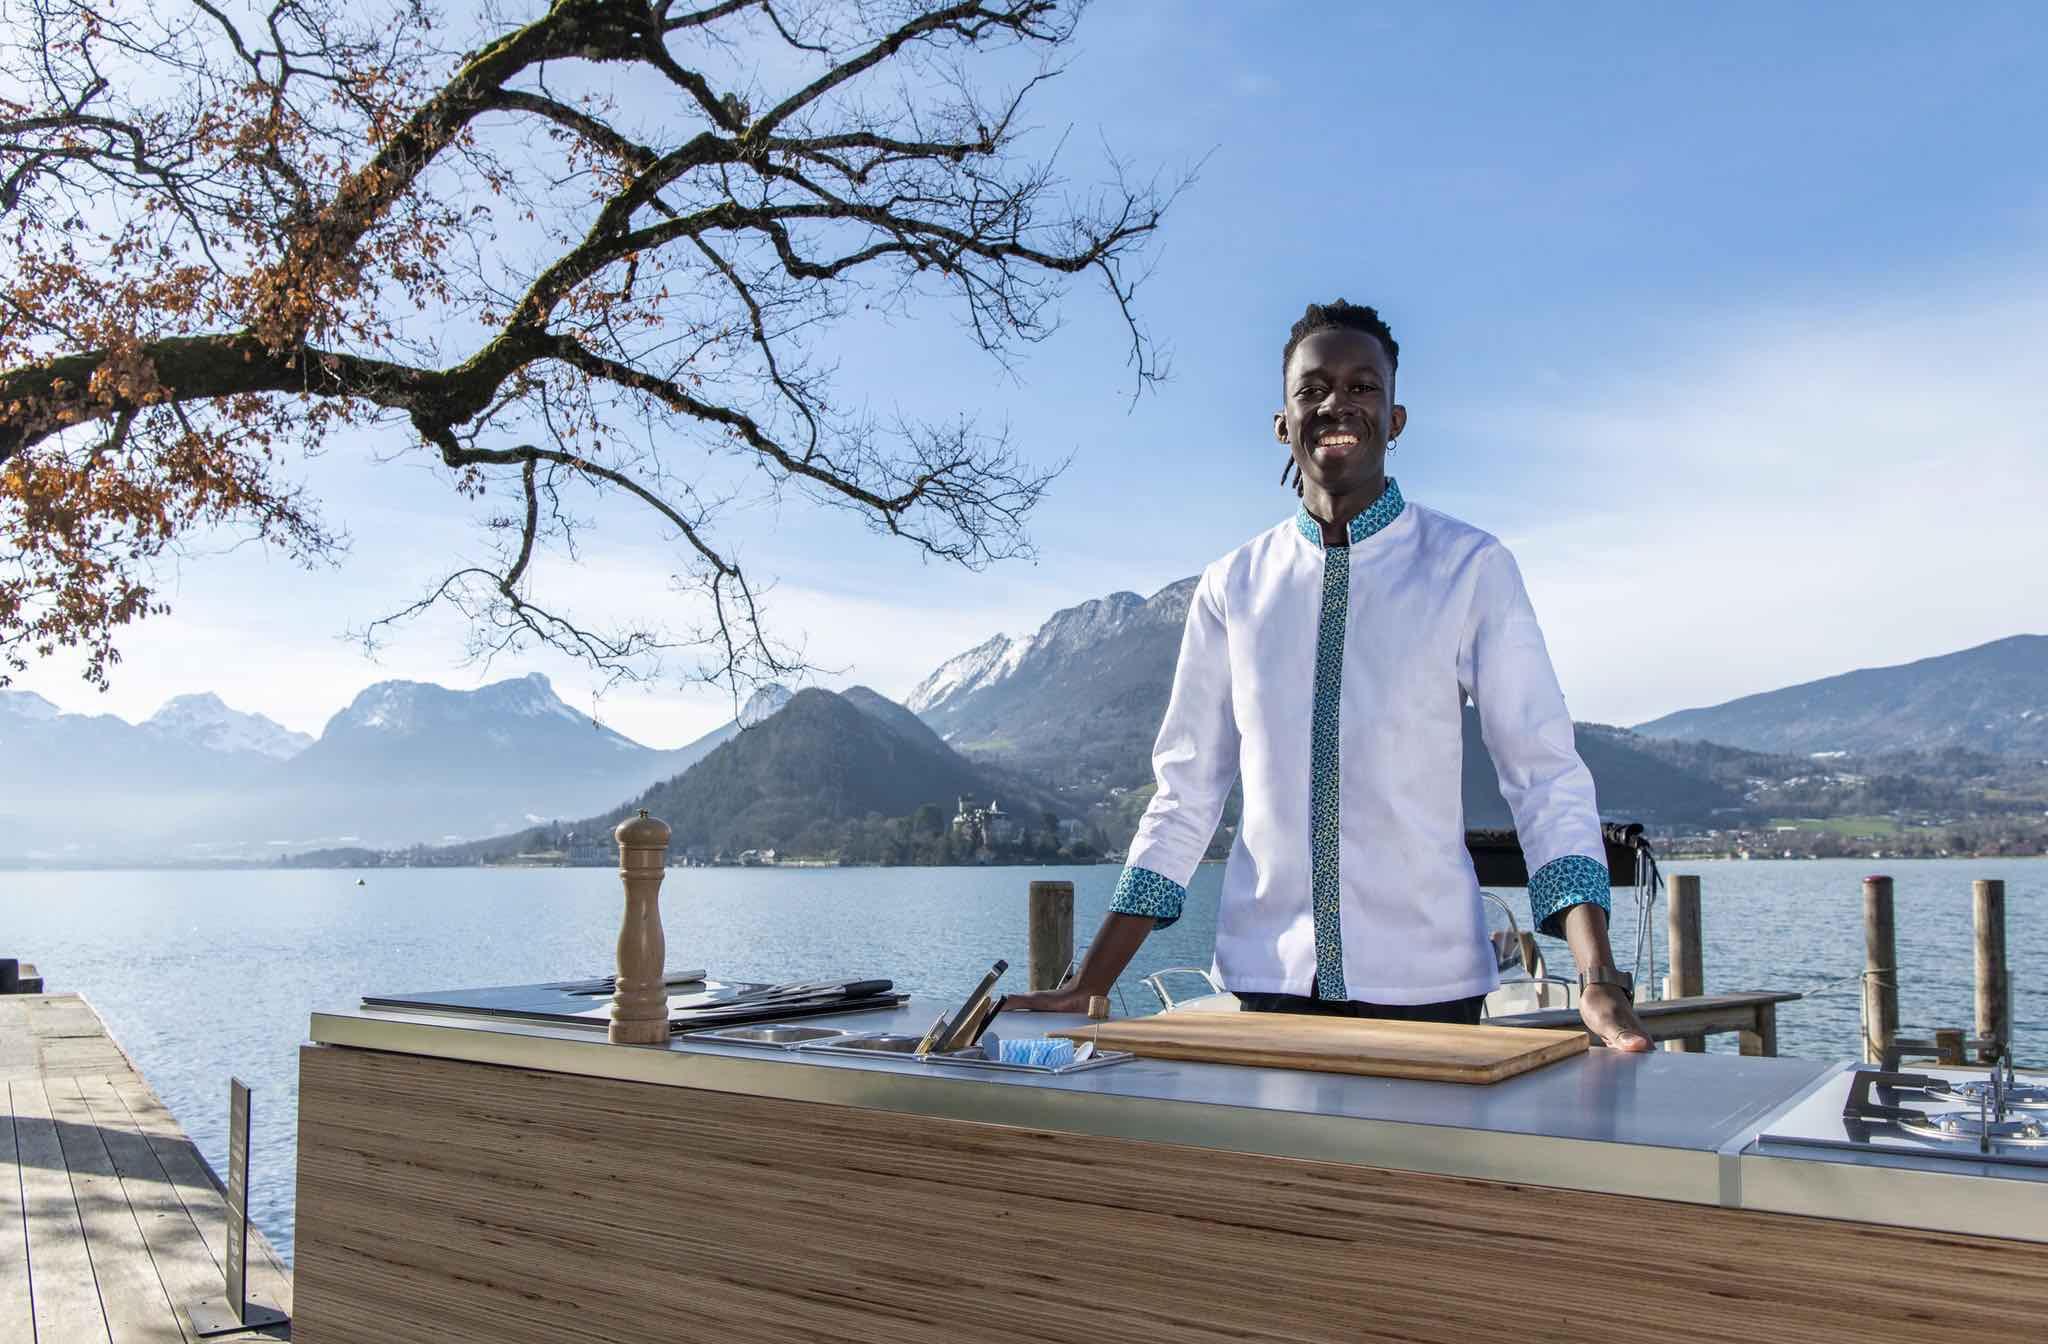 cuisine ouverte - Mory Sacko - France 3 - Top Chef - MoSuke -